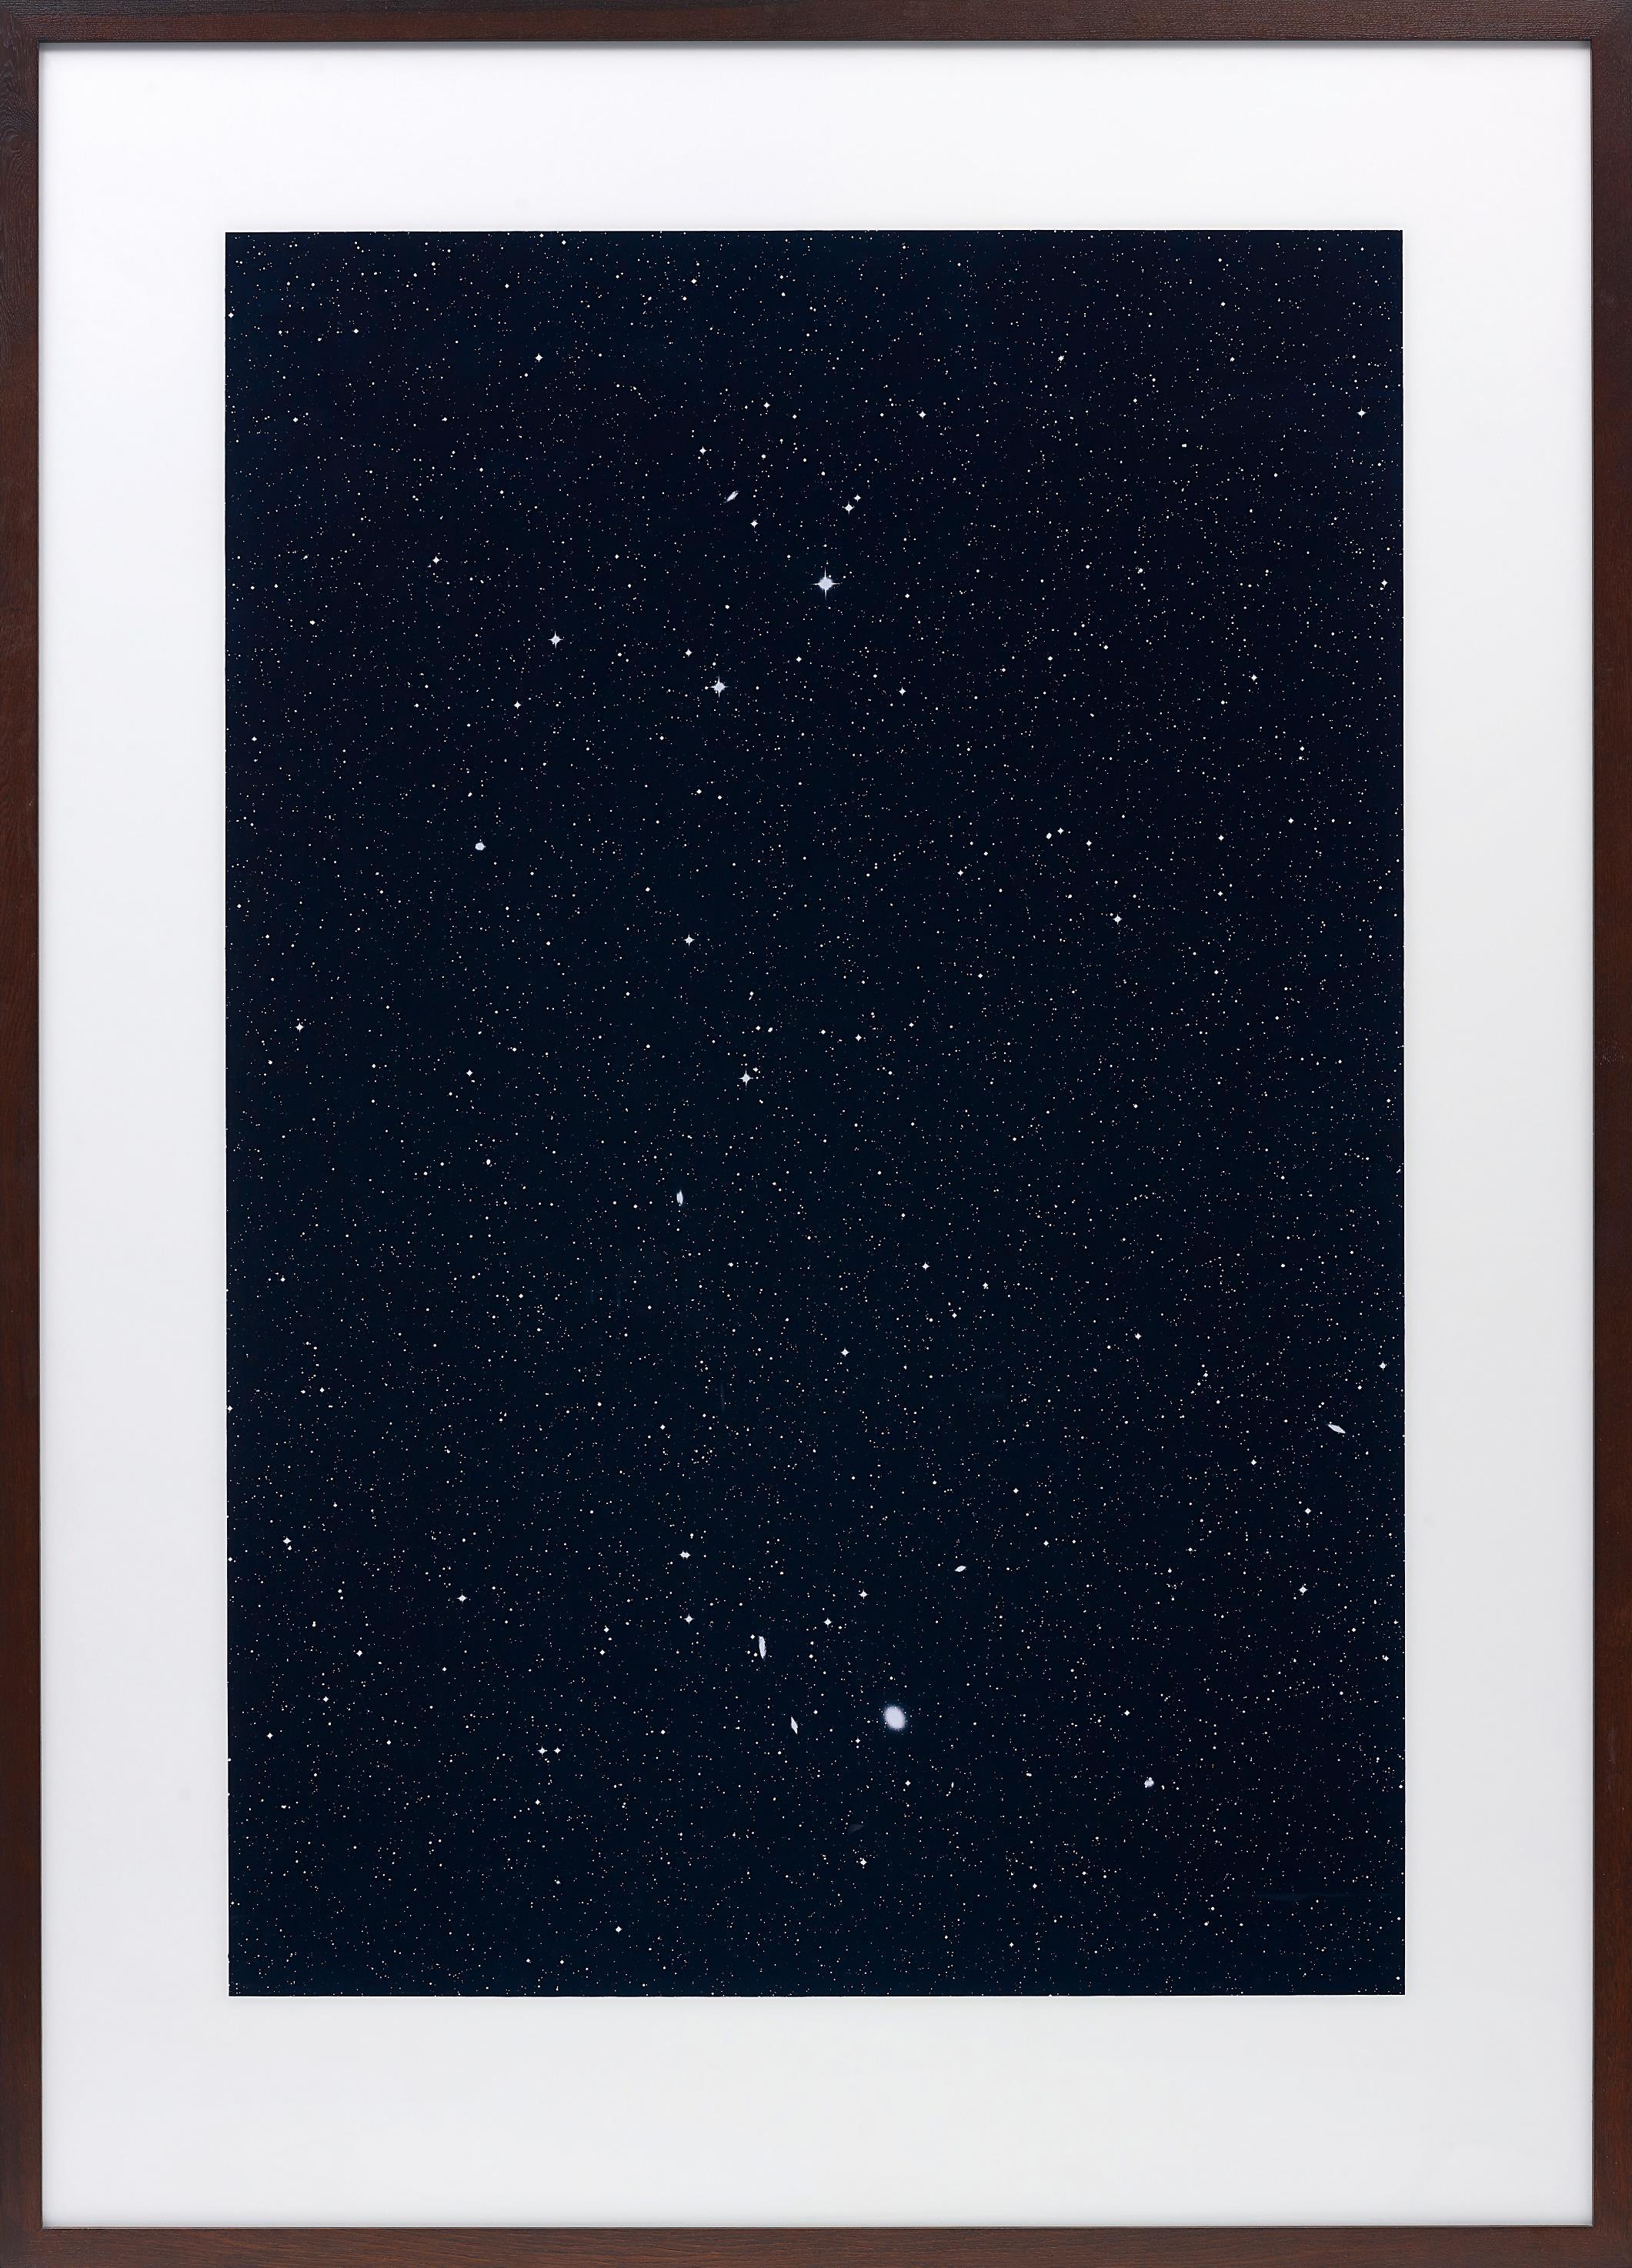 Thomas Ruff-Sterne 11H 12M/-35°-1989